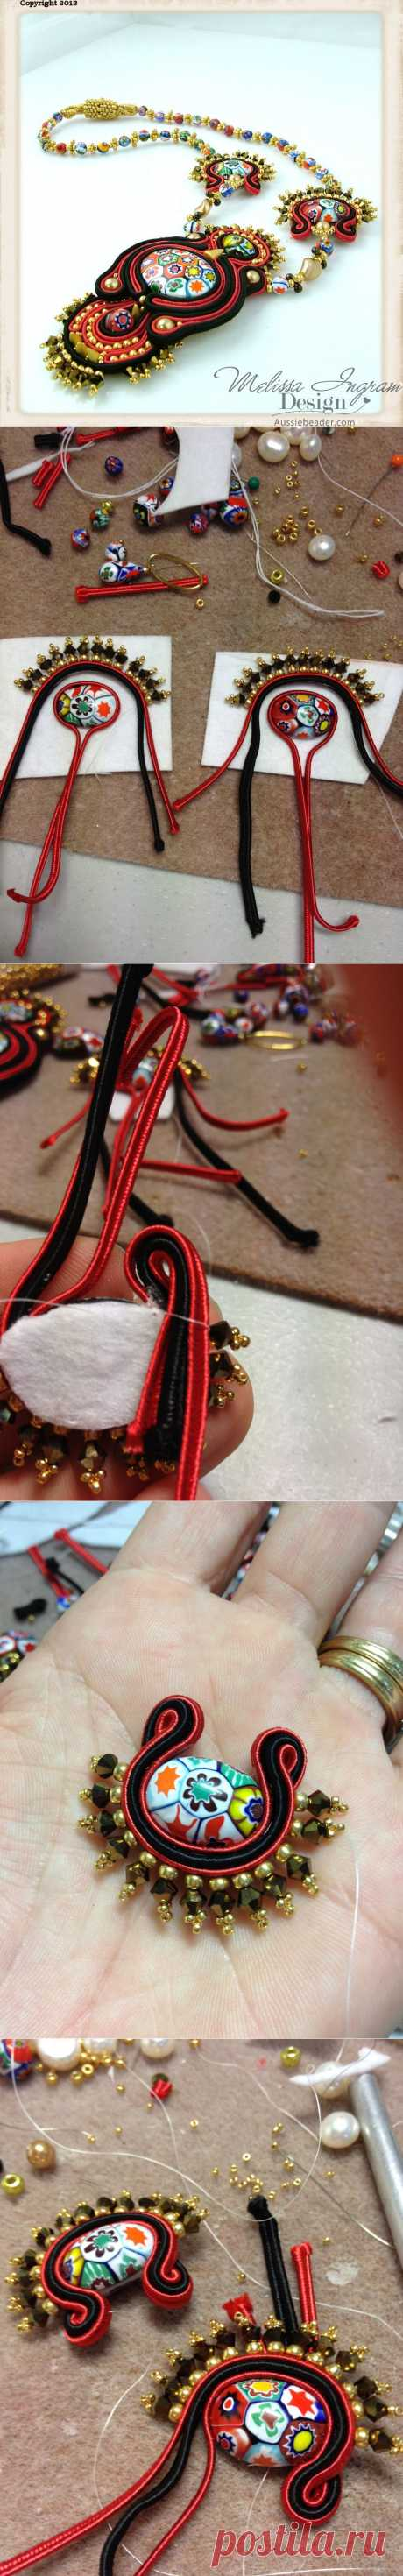 Social Butterfly Jewellery Design: Achieving Soutache Symmetry